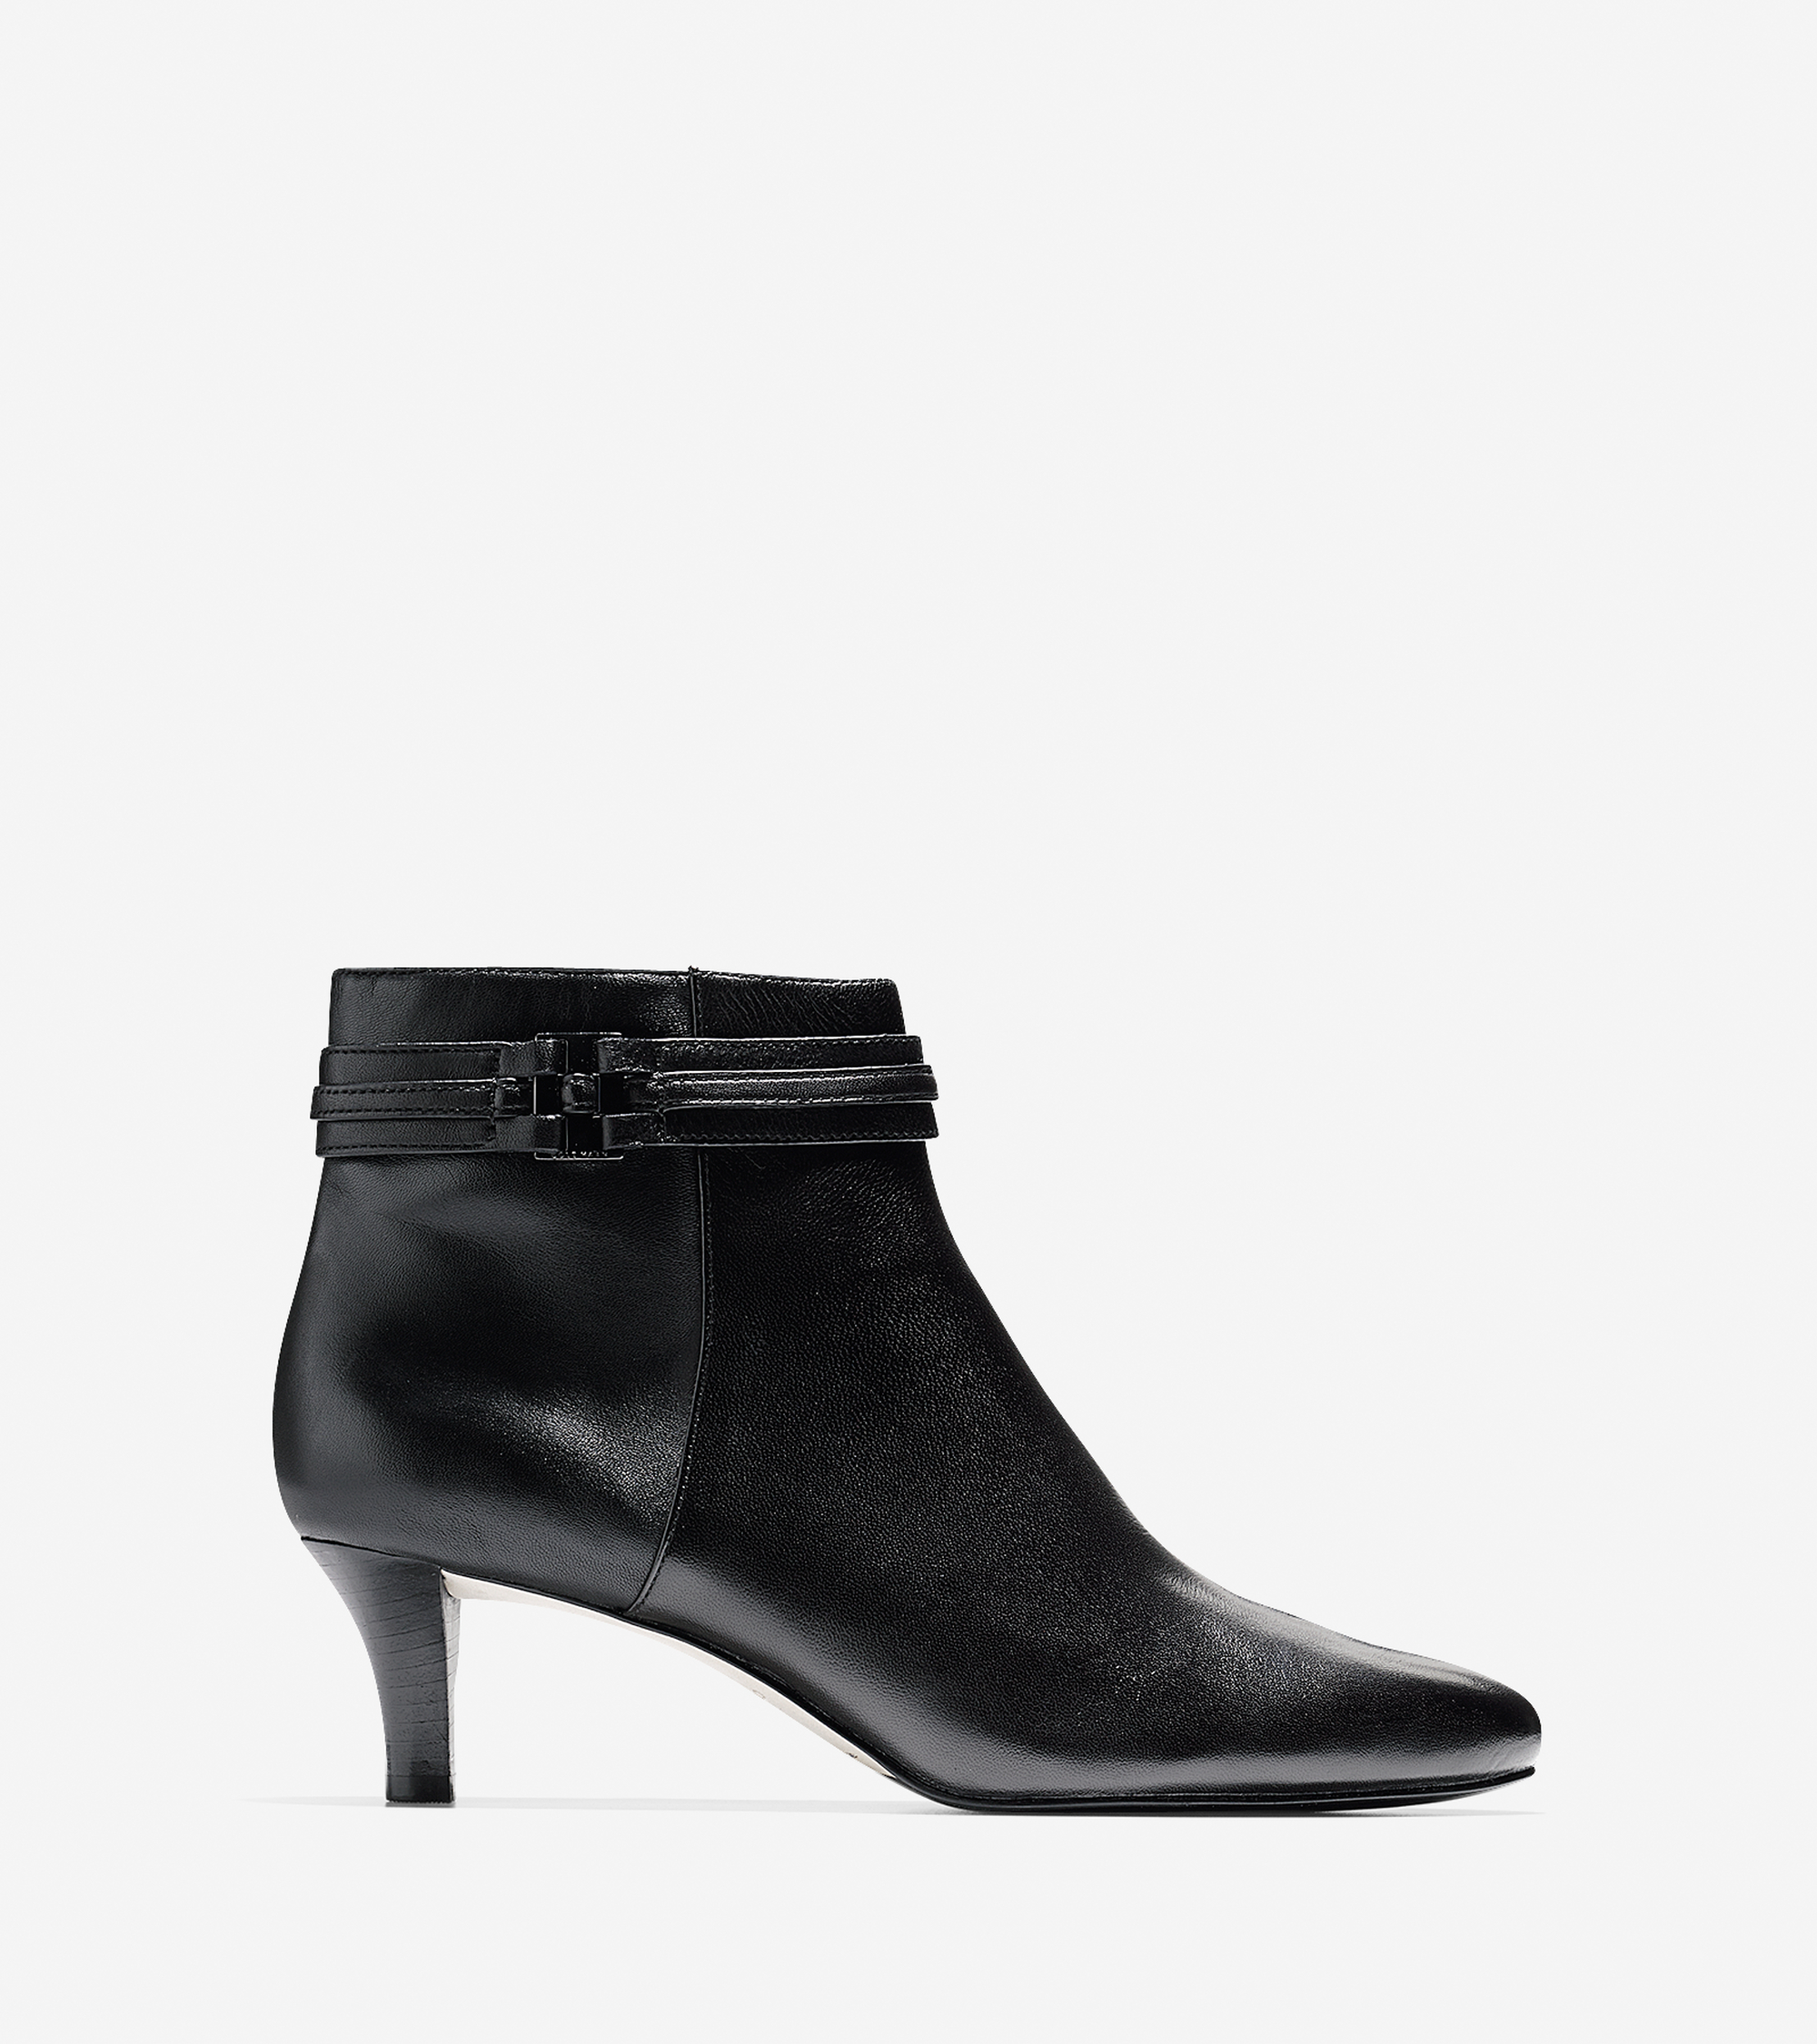 cole haan tamera boot in black lyst